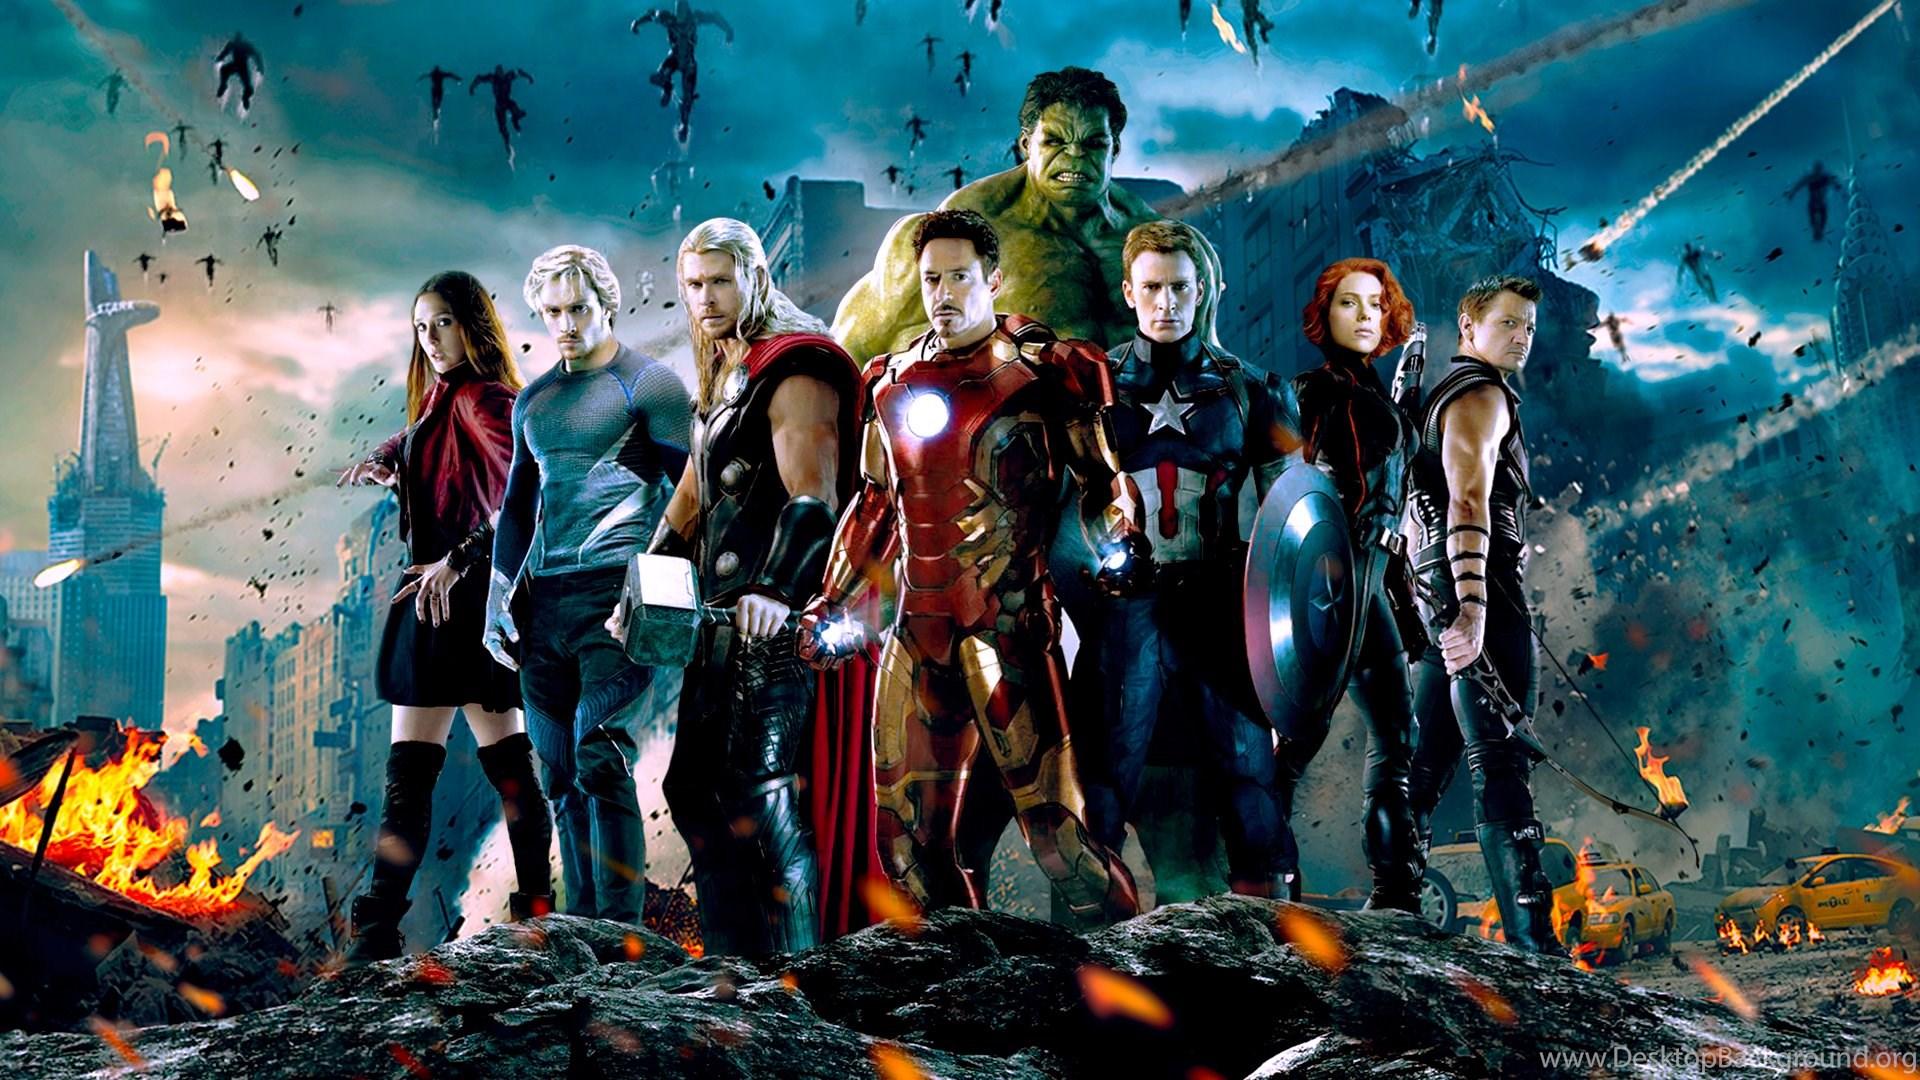 Avengers Age Of Ultron Wallpapers Hd 1080p For Desktop 1920x1080 Desktop Background